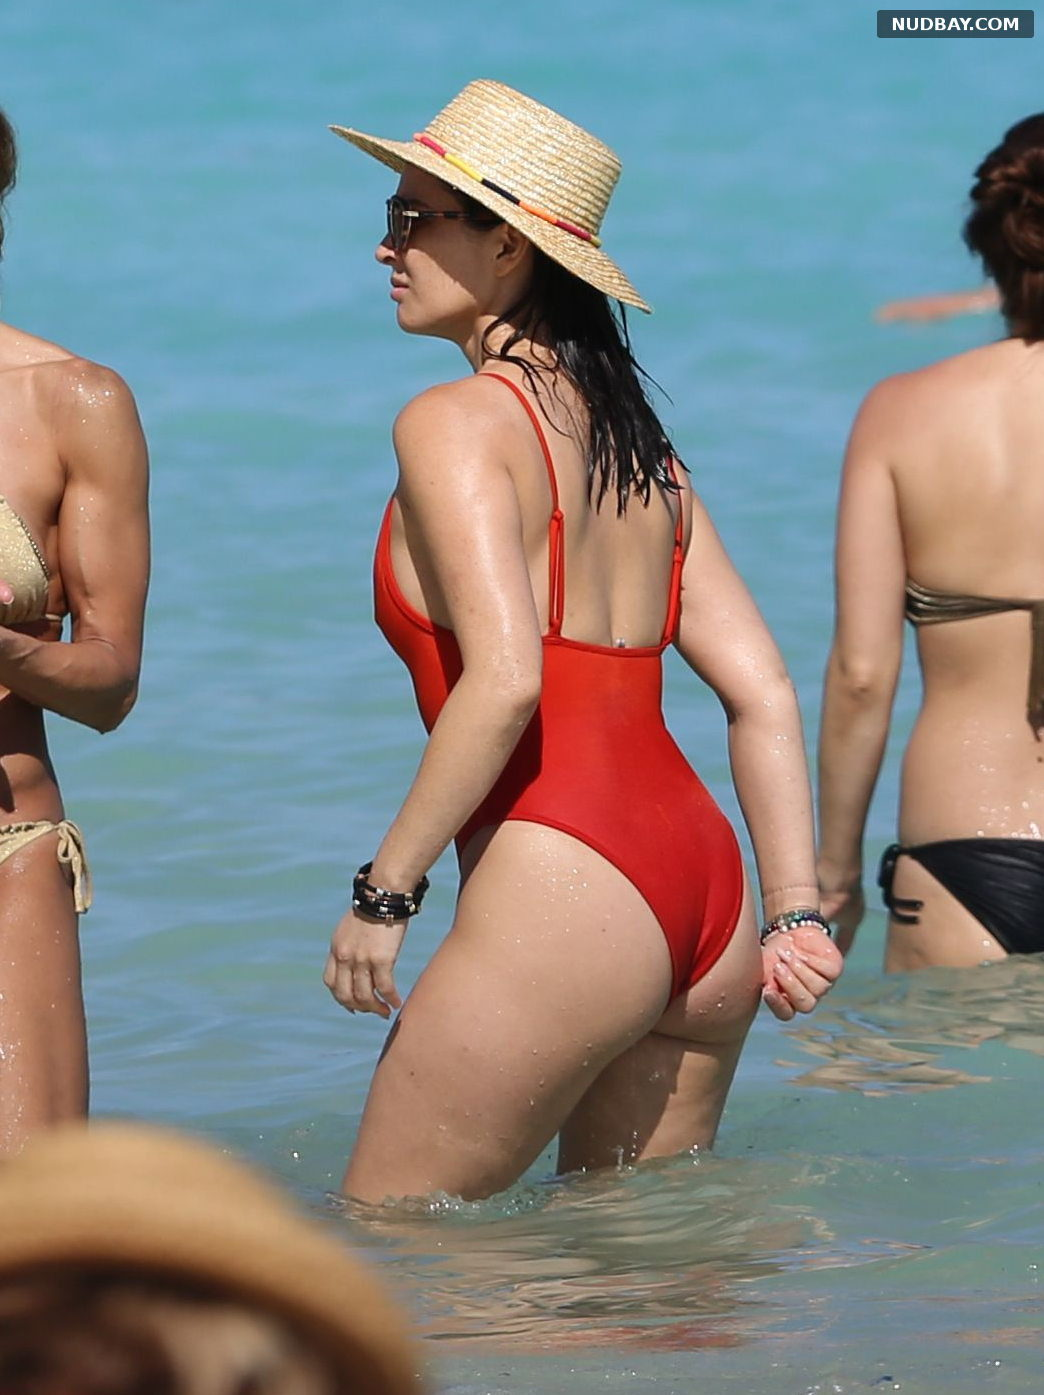 Olivia Munn Ass in a bikini on the Beach in Hawaii Dec 09 2017